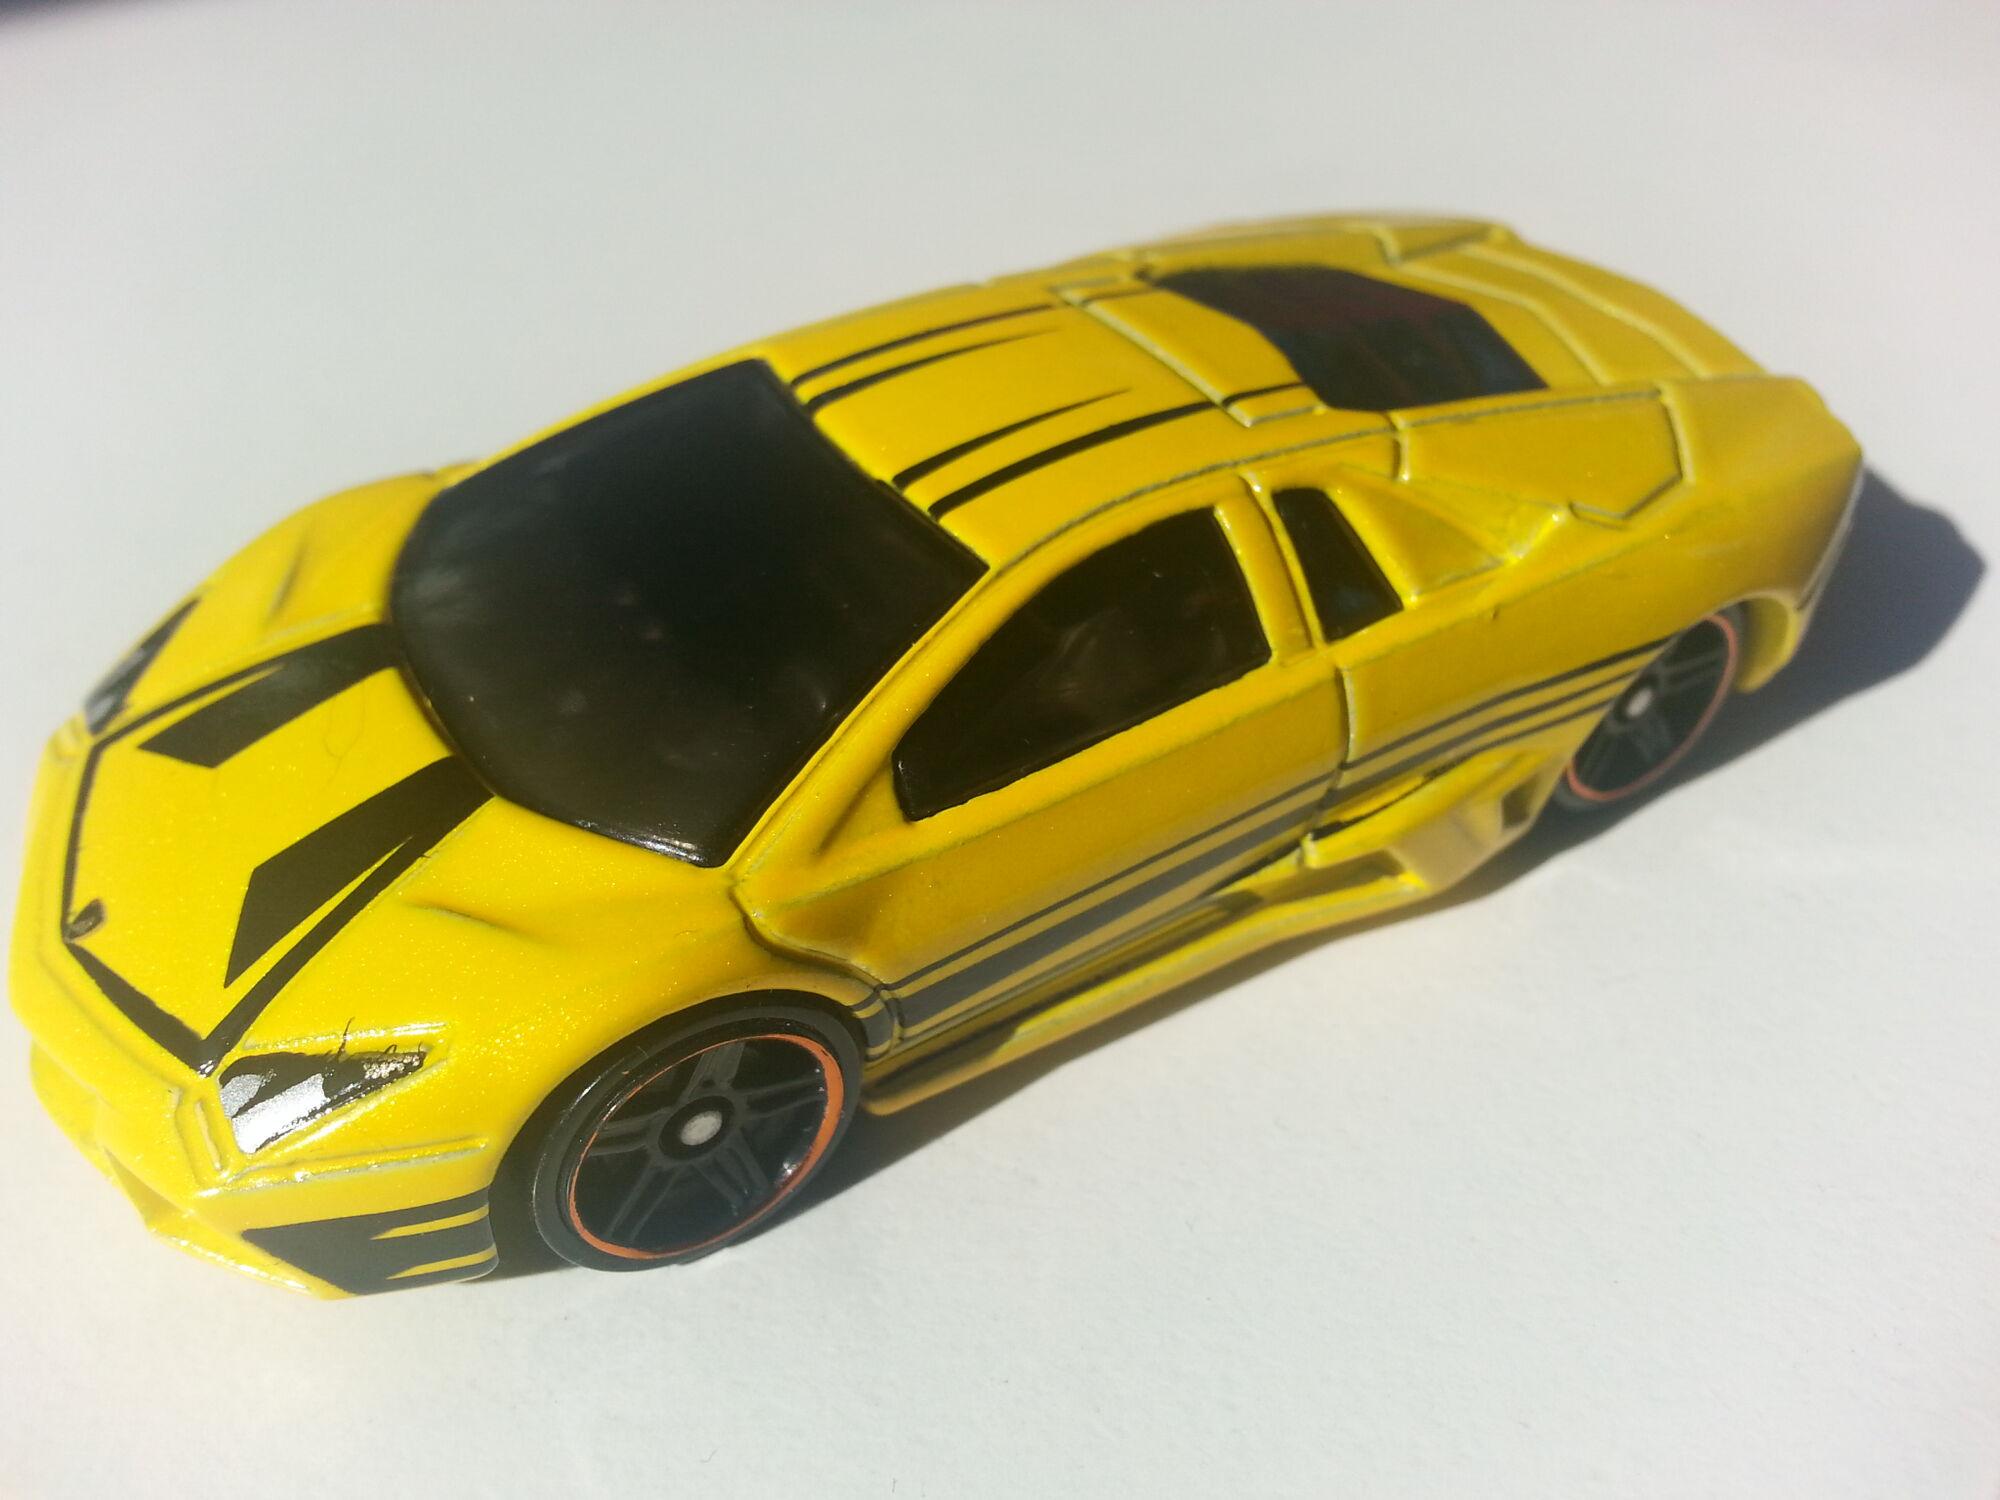 2000?cb=20140317161300 Surprising Lamborghini Gallardo Hot Wheels Wiki Cars Trend